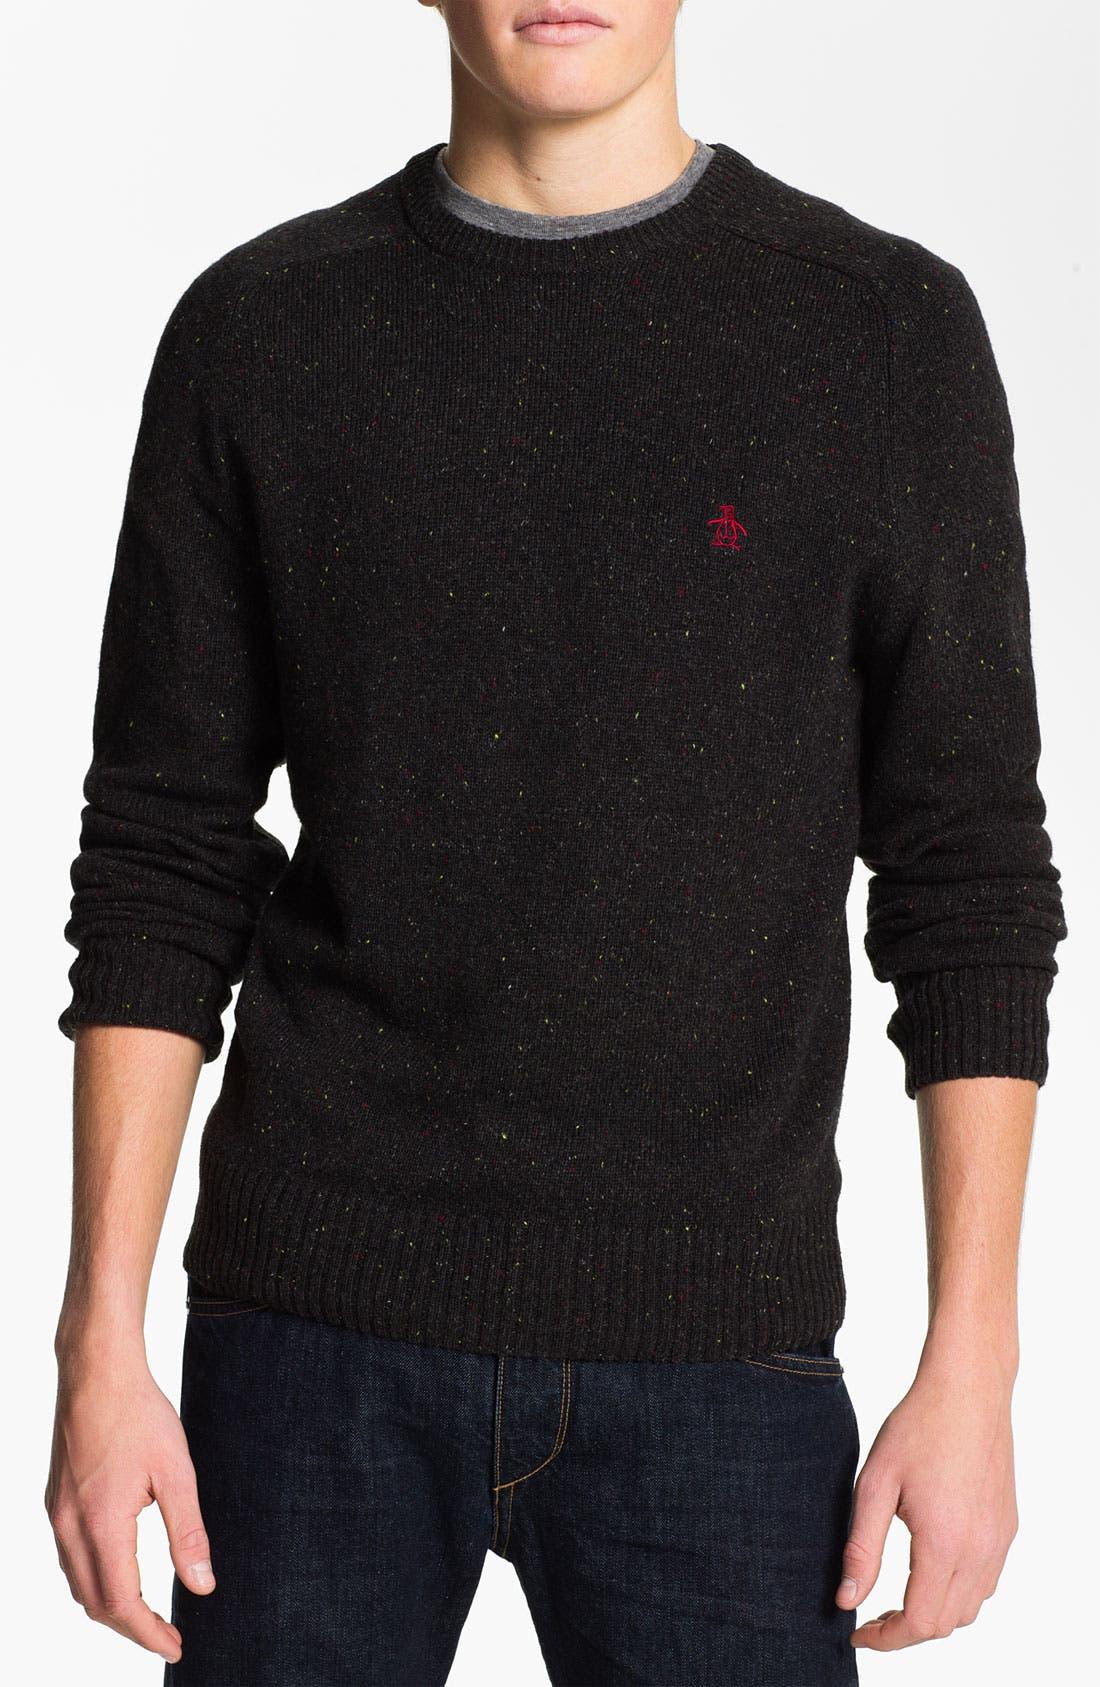 Main Image - Original Penguin Speckled Knit Crewneck Sweater